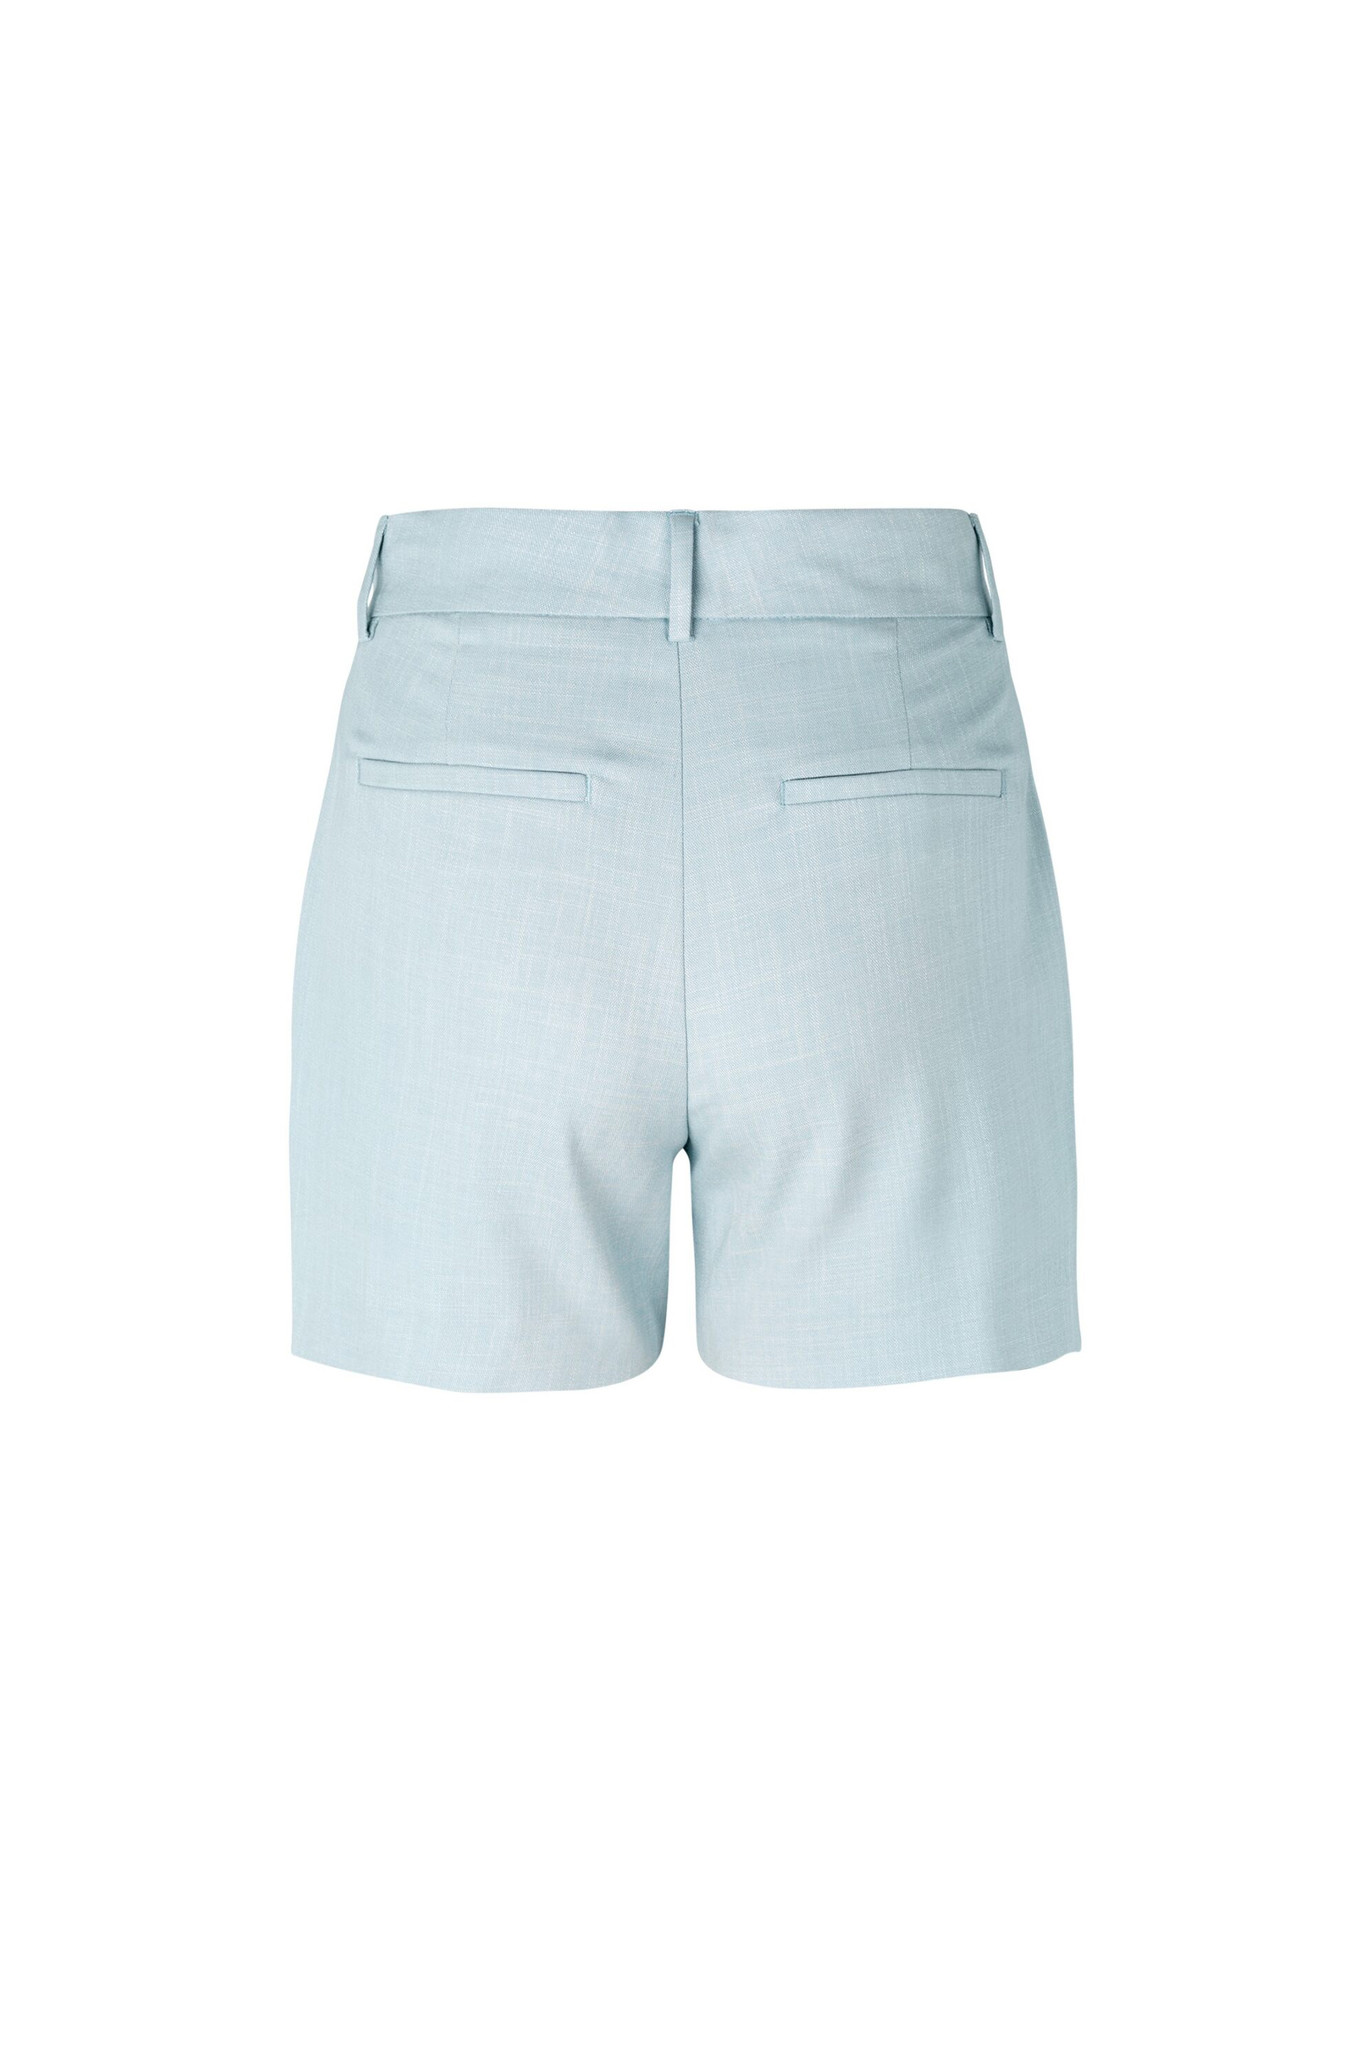 Dena Shorts 721 - Sky Blue Melange-7